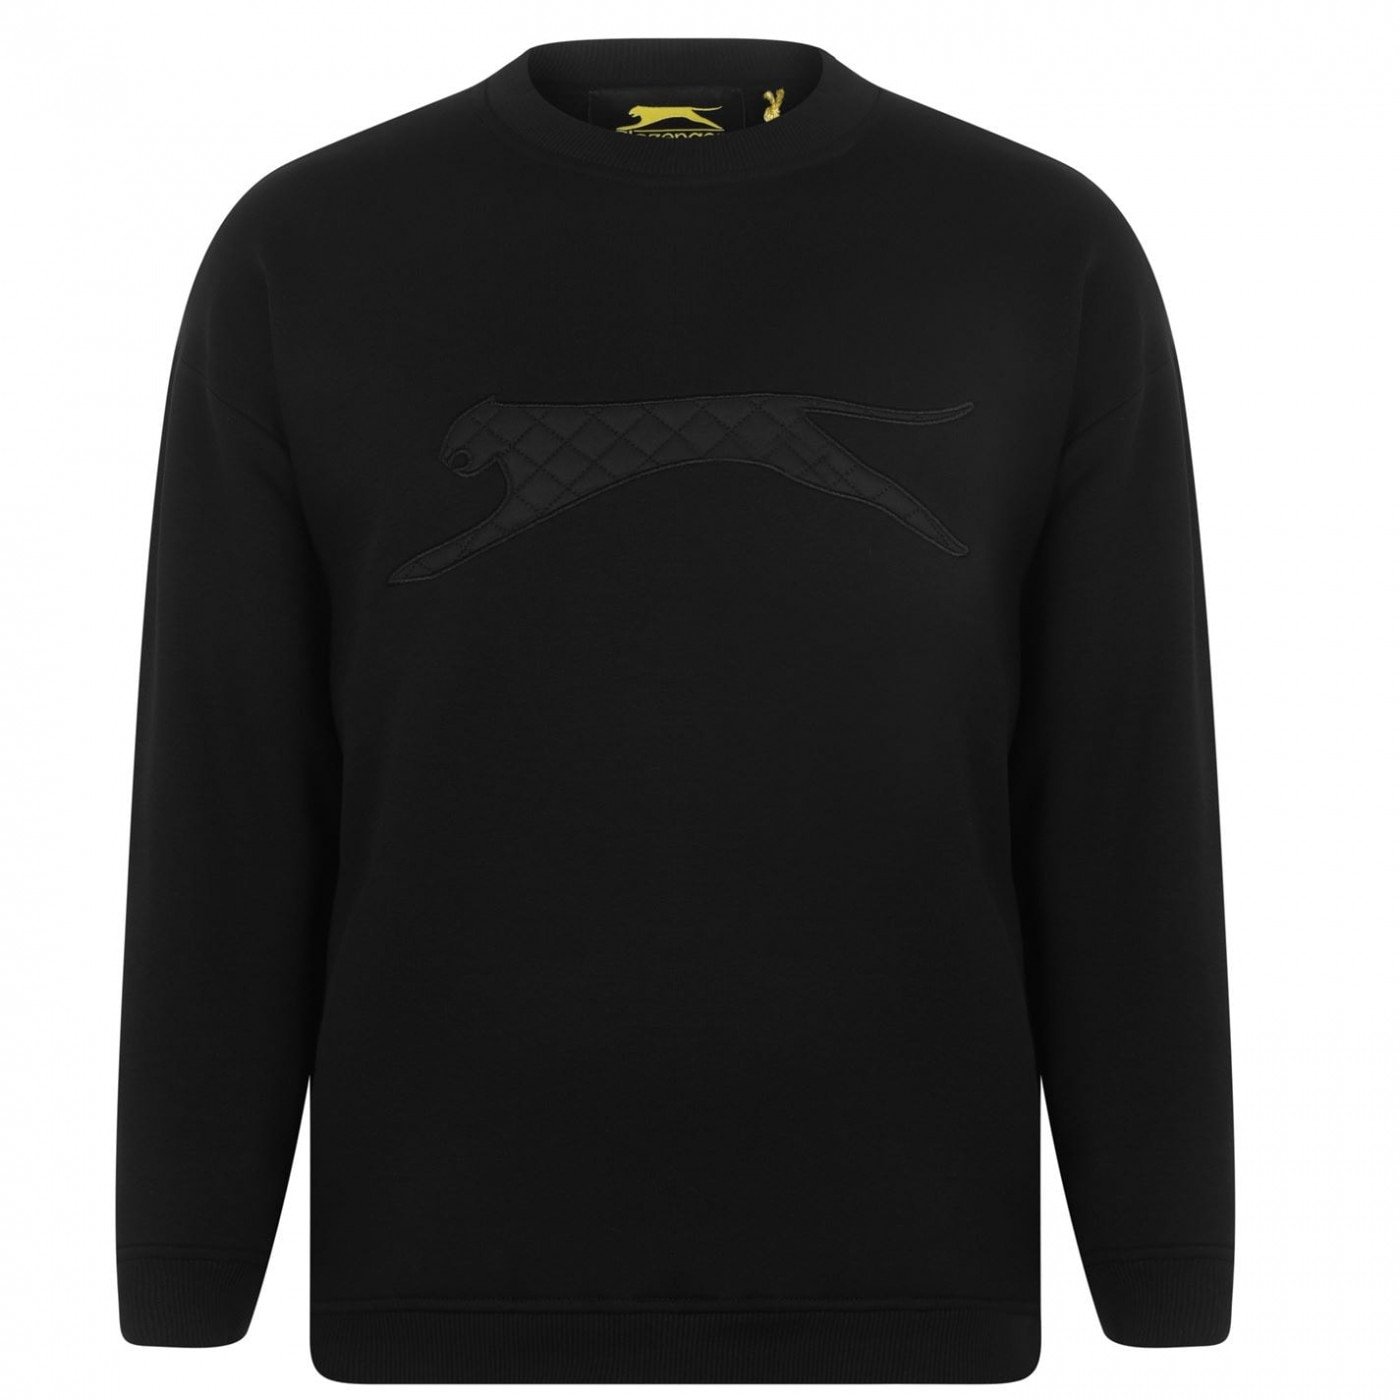 Slazenger Banger Banger Crew Sweatshirt